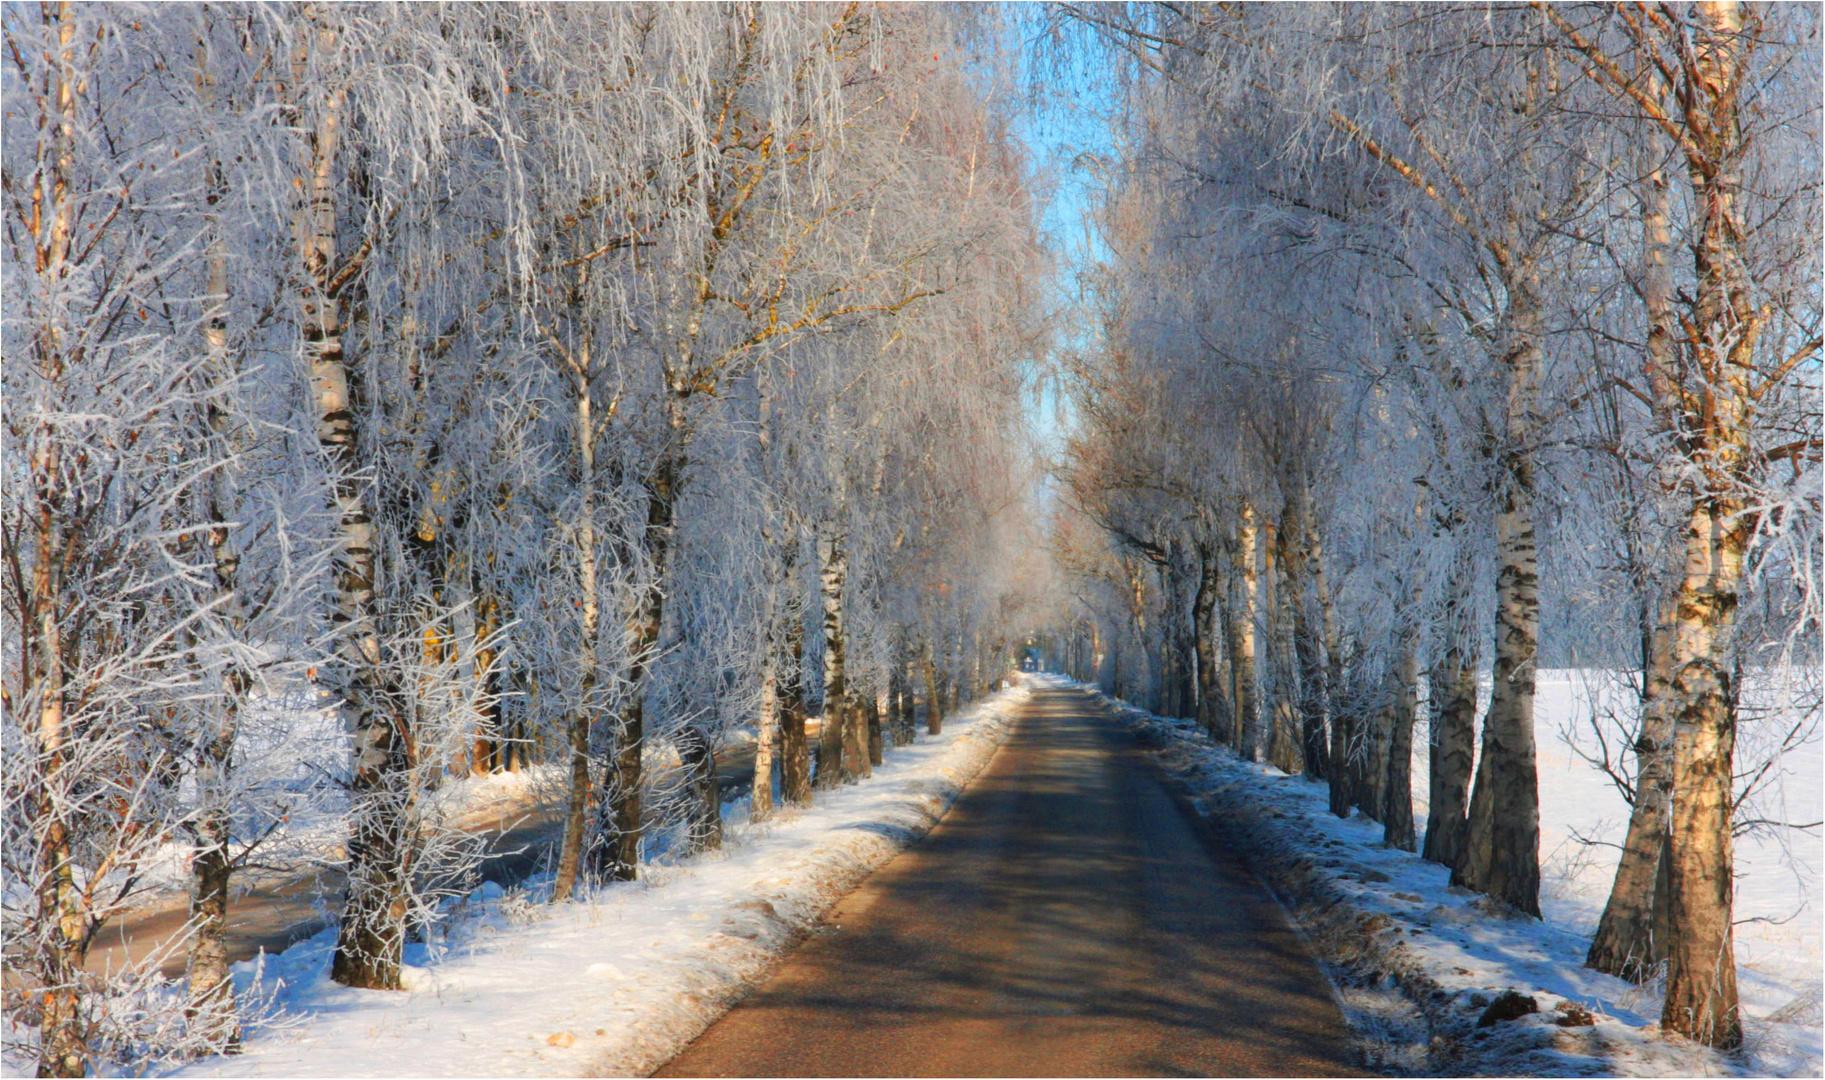 Wintertraum im März